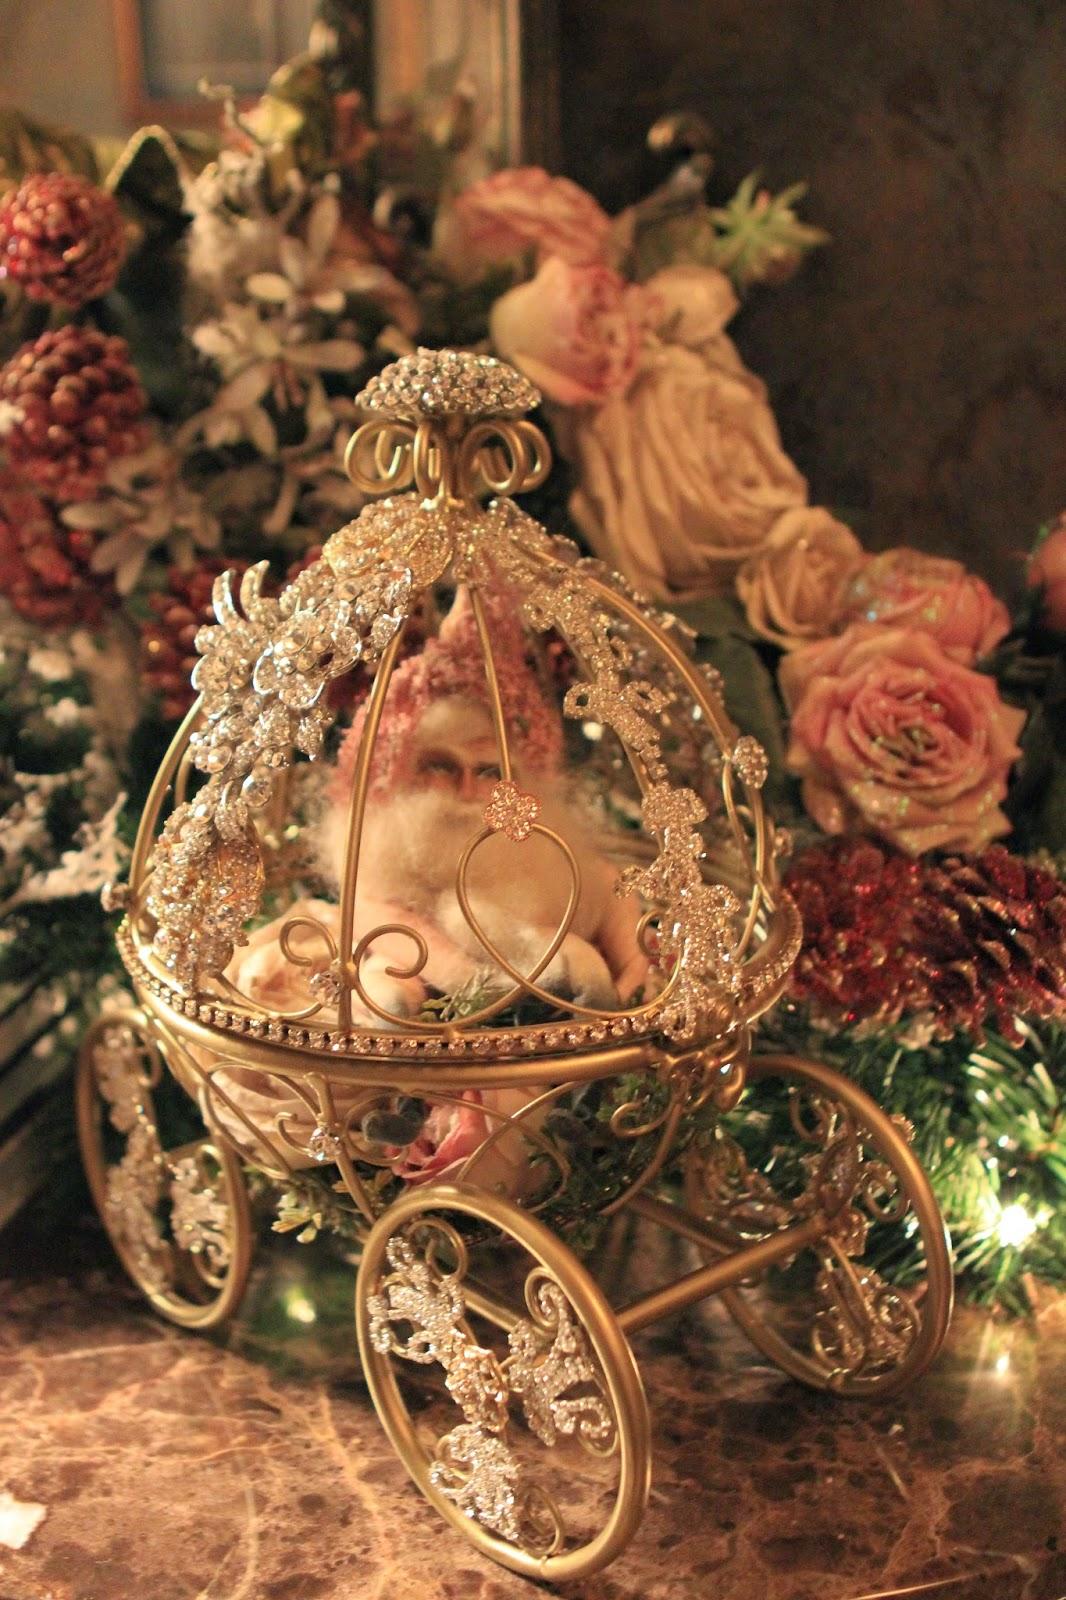 #AC6F1F Romancing The Home: Christmas Decor  More Memories 5545 decorations noel geneve 1066x1600 px @ aertt.com